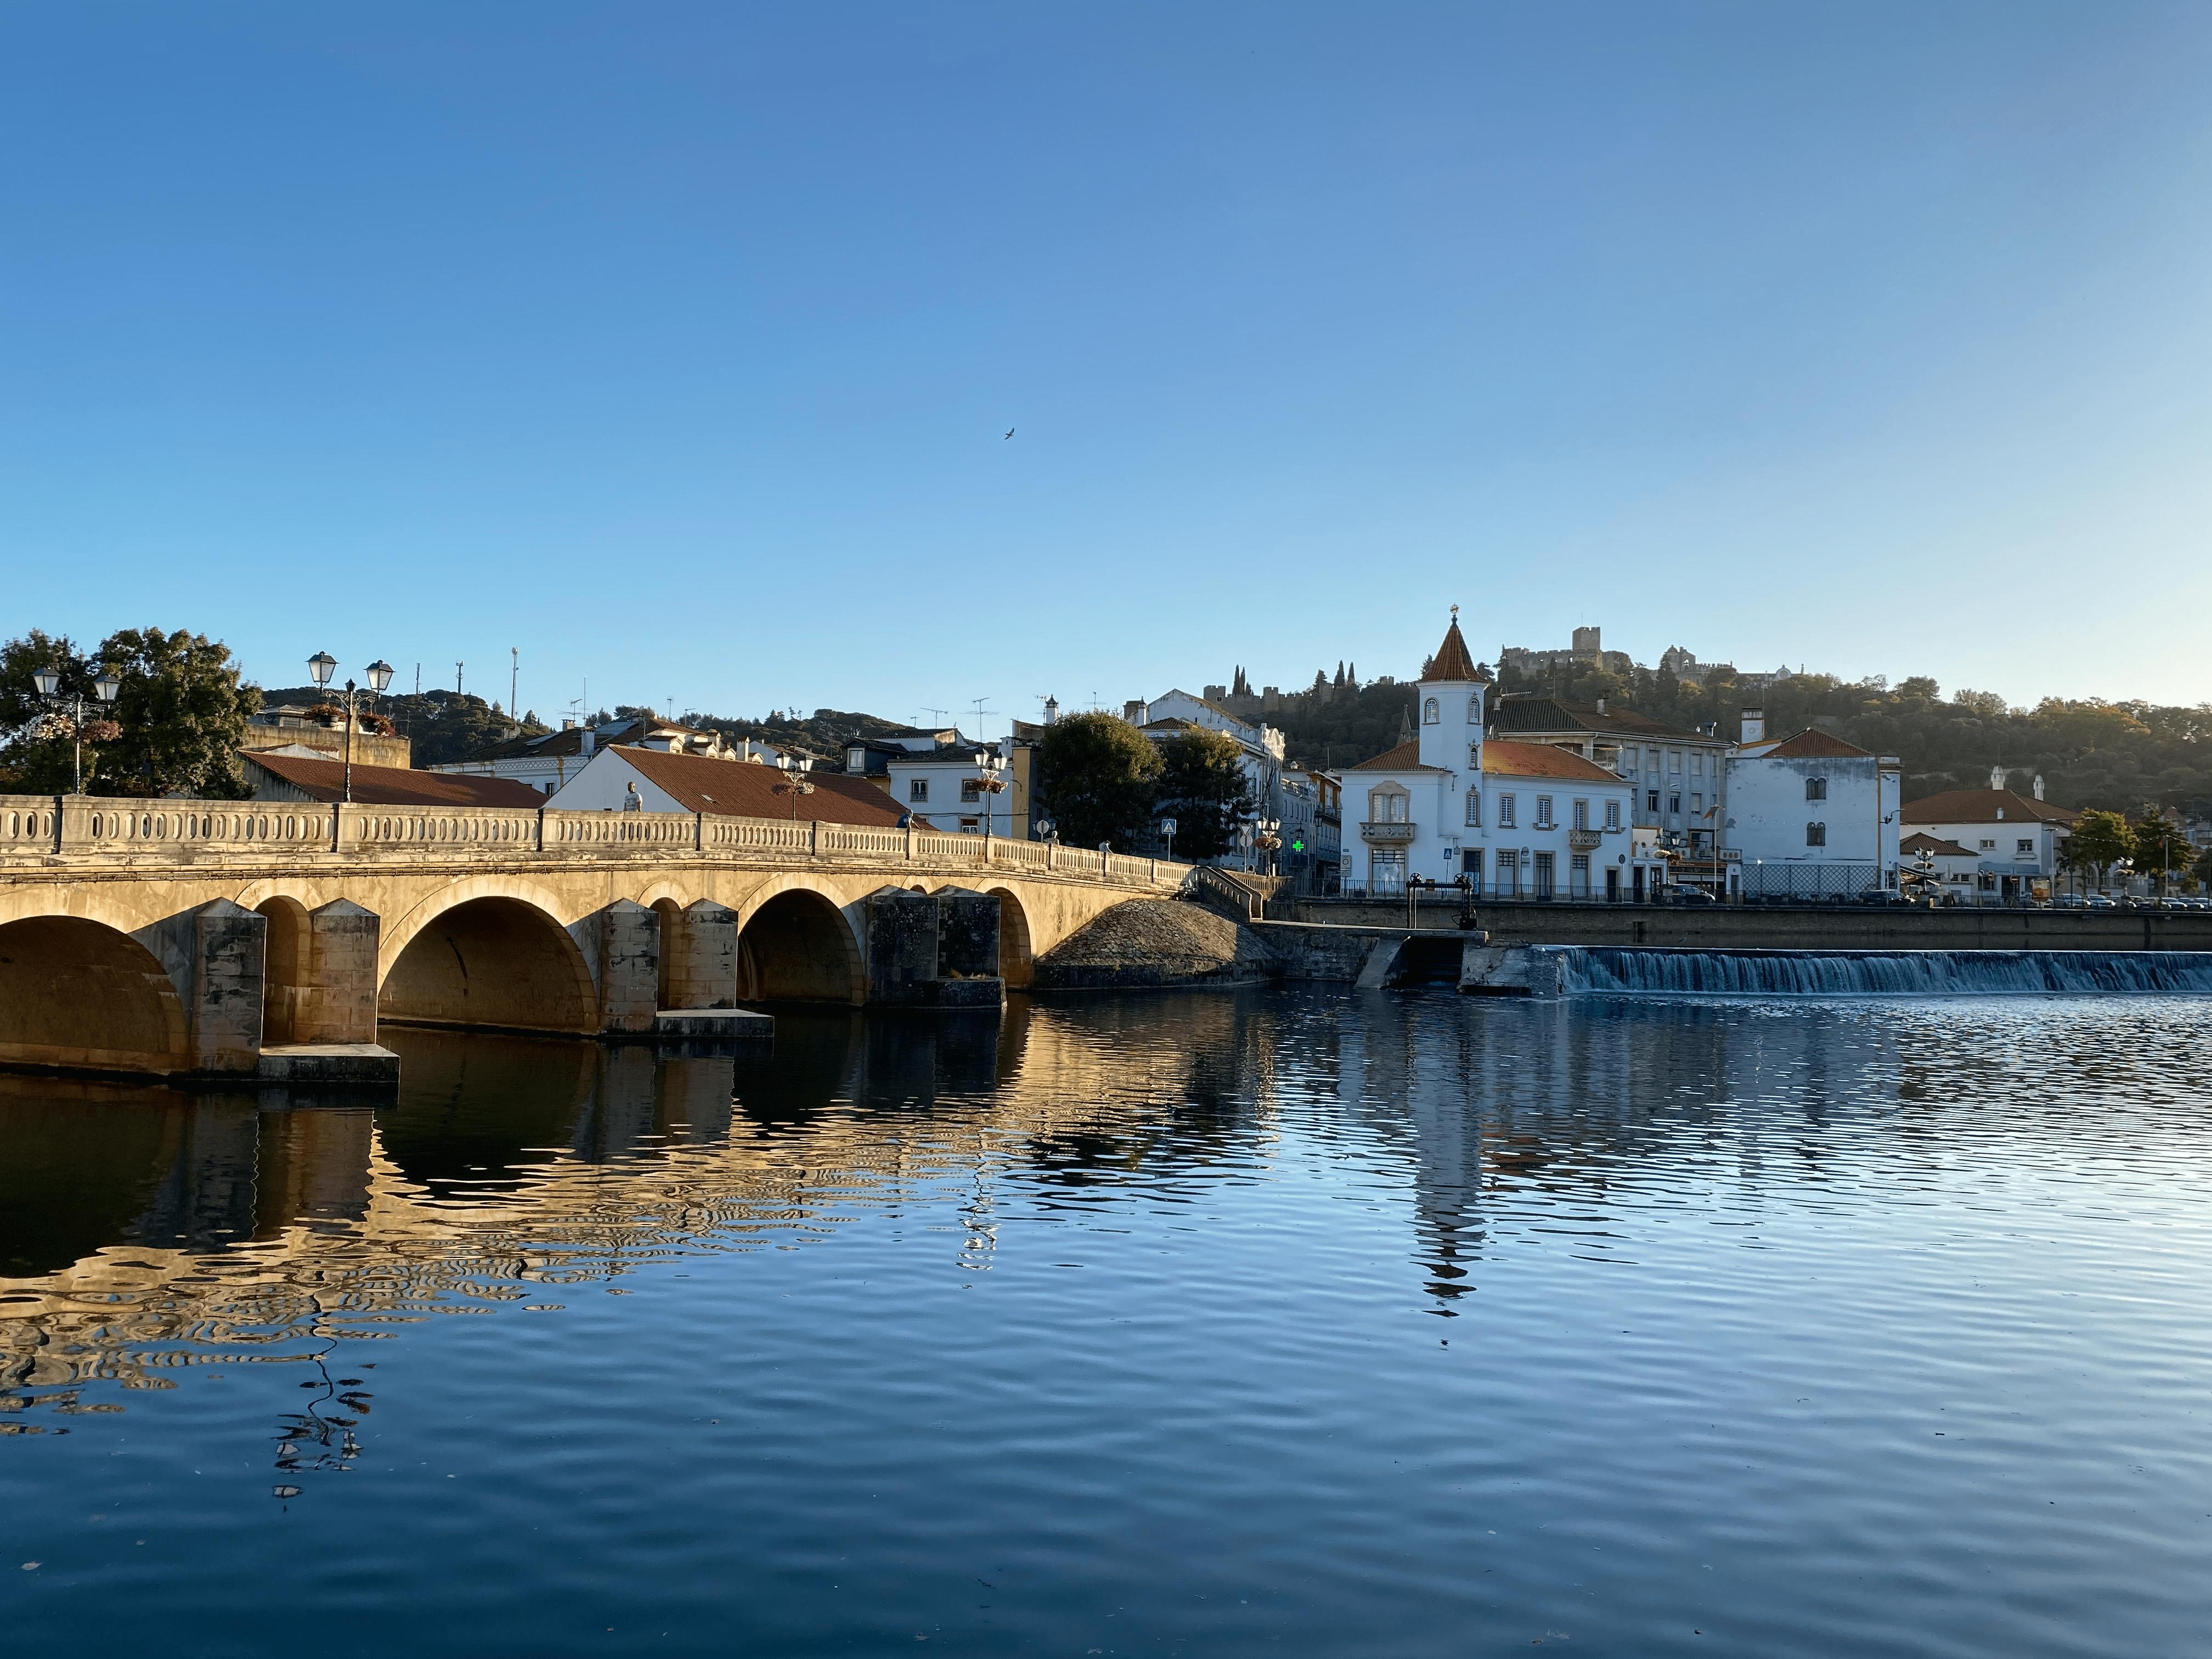 Vista para a cidade de Tomar e para o convento de cristo. View to Tomar's city and the convent of christ